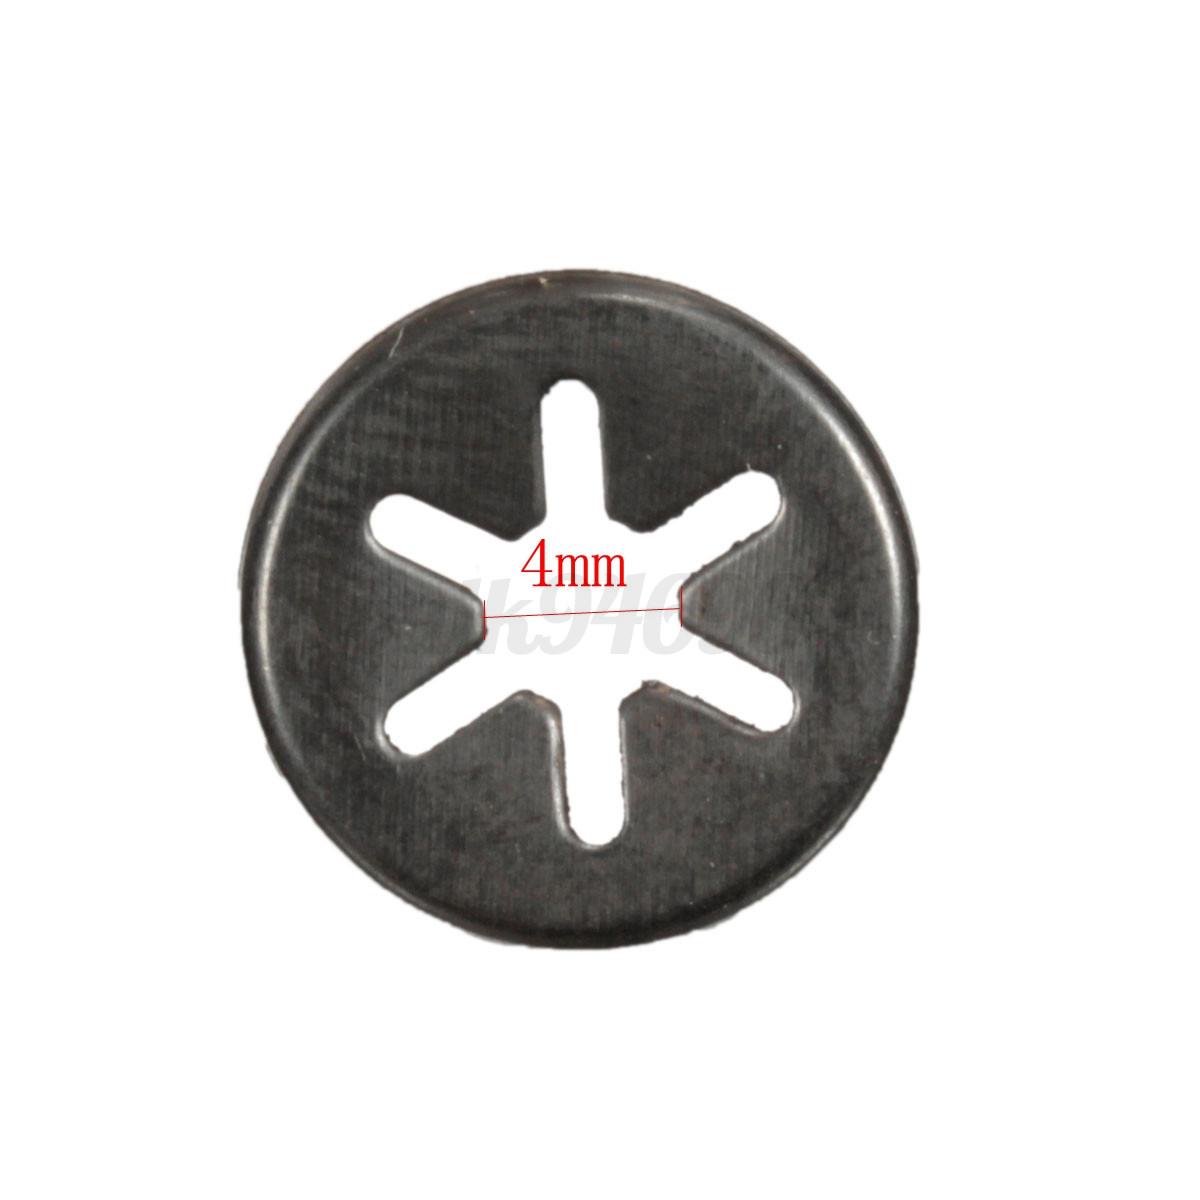 3 6mm Starlock Push On Fasteners Locking Washers Speed